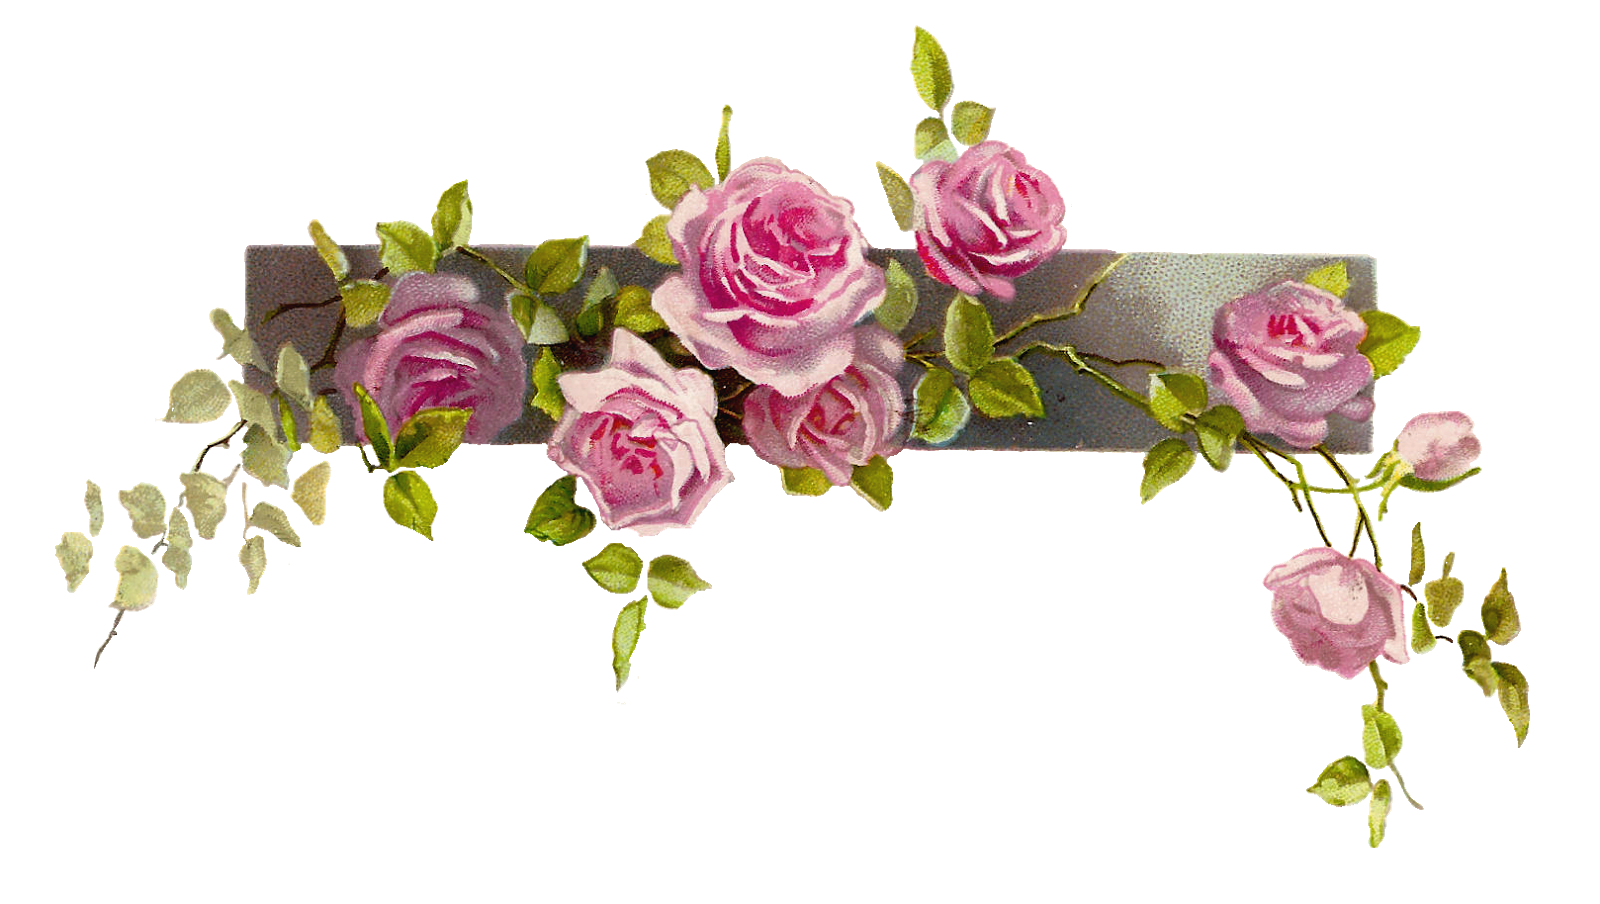 Garland clipart rose, Garland rose Transparent FREE for.